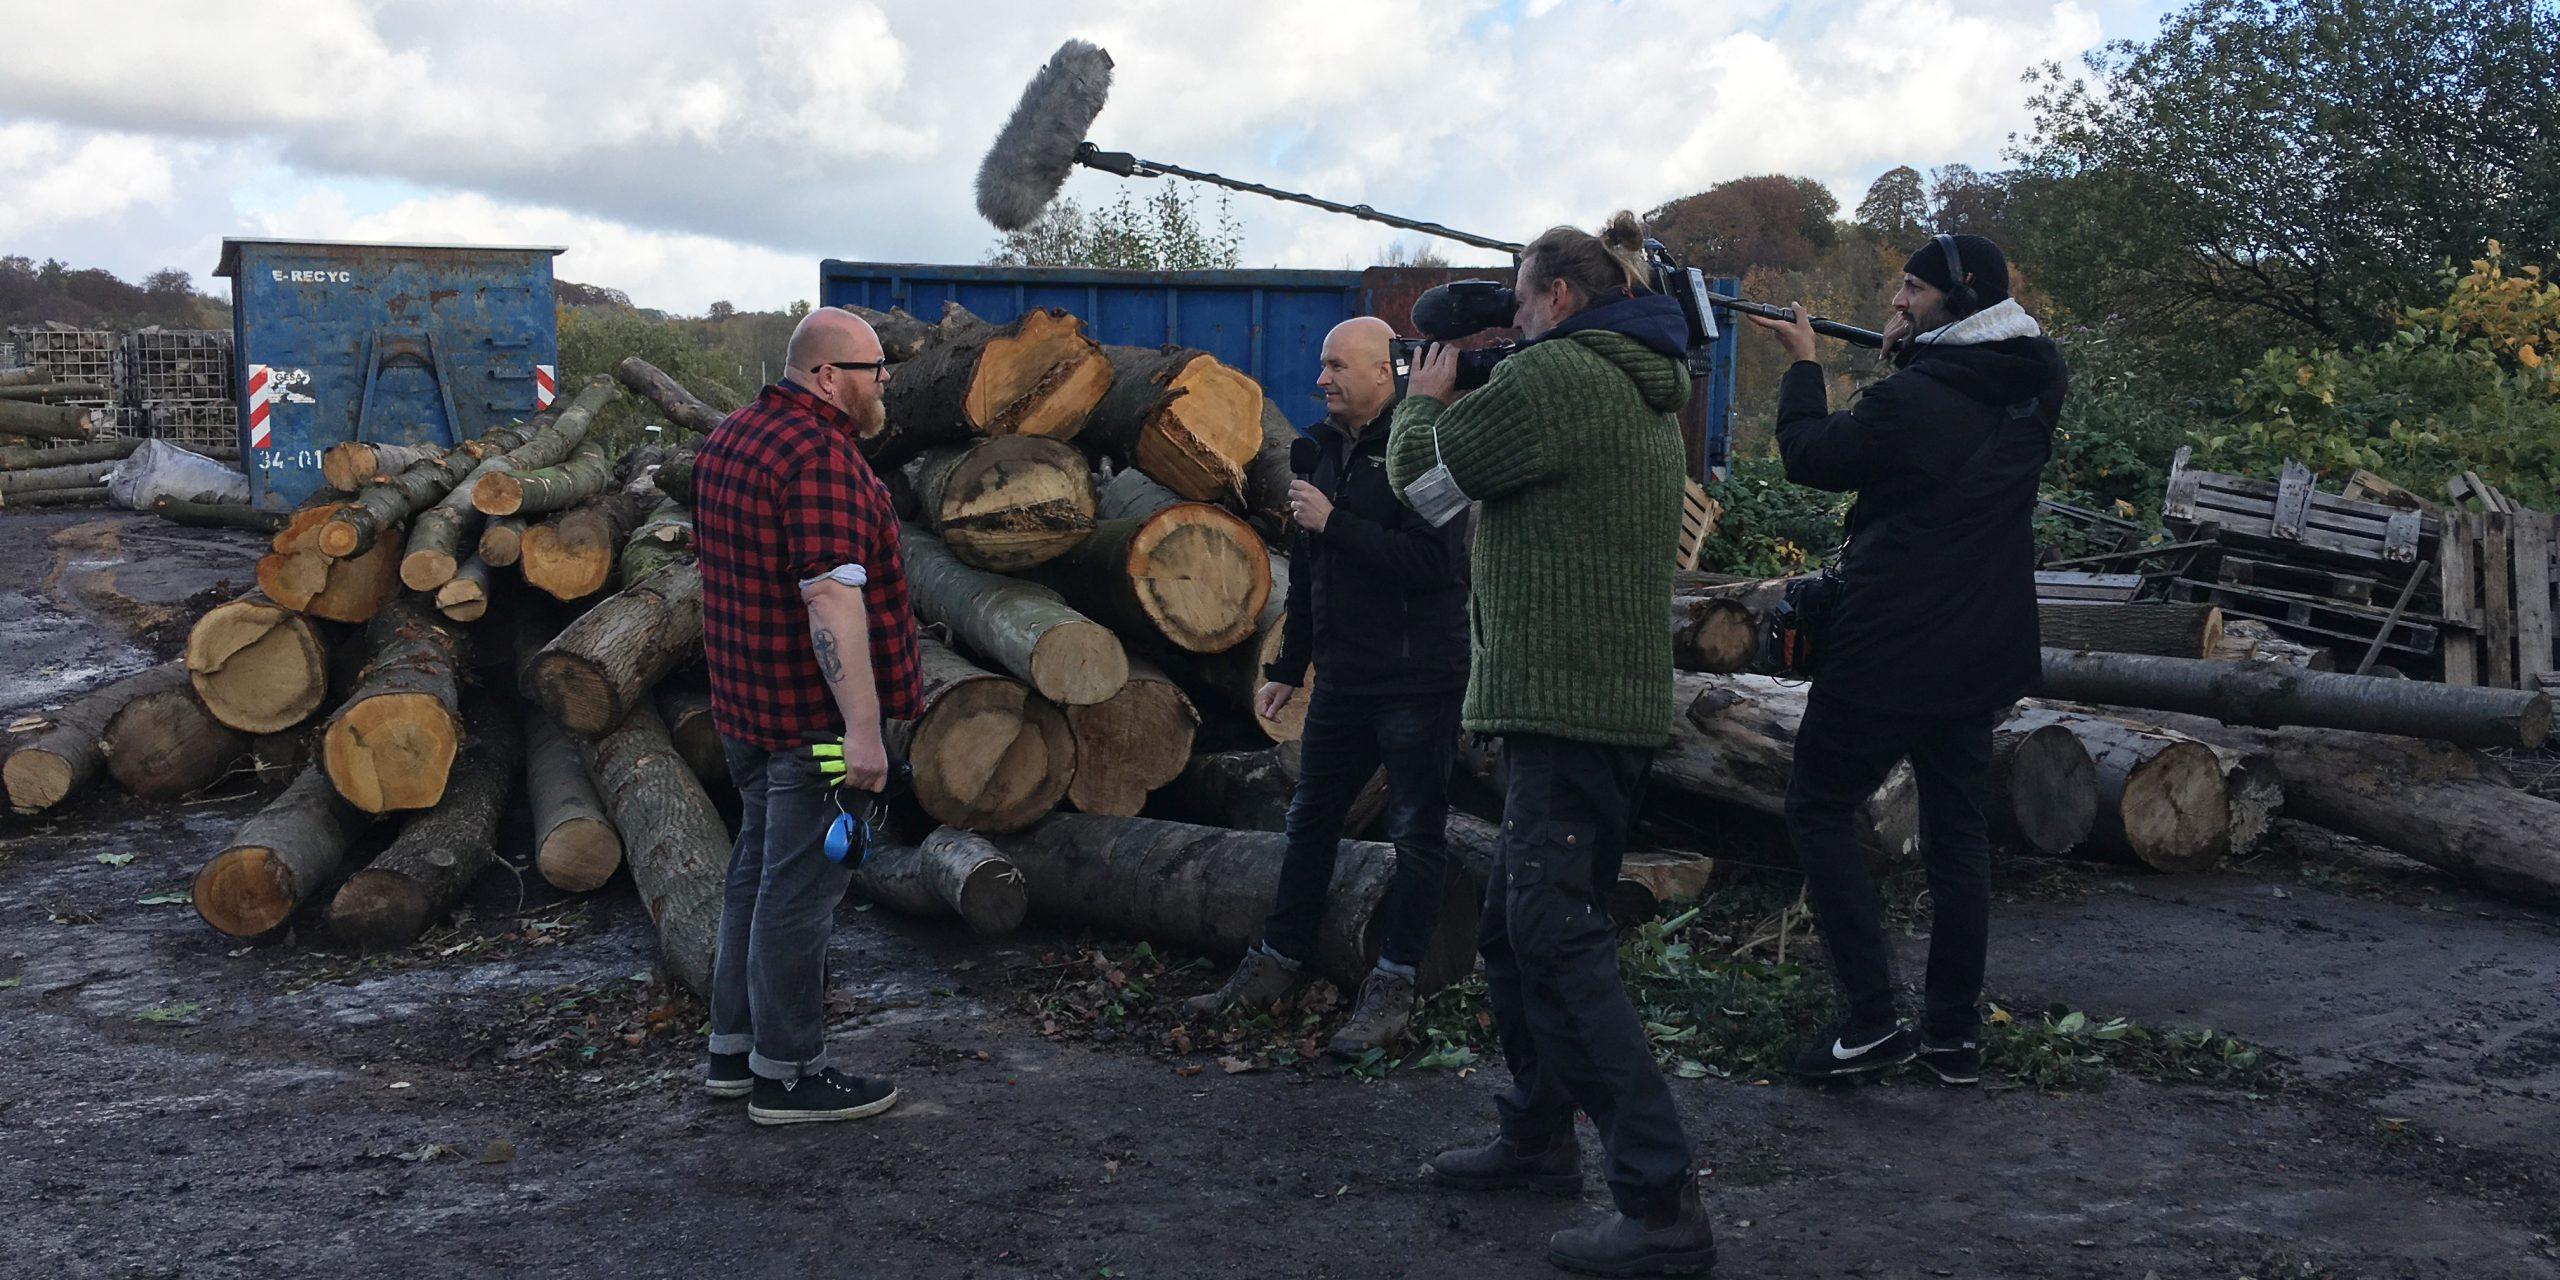 Besuch des WDR am Holzenergiehof